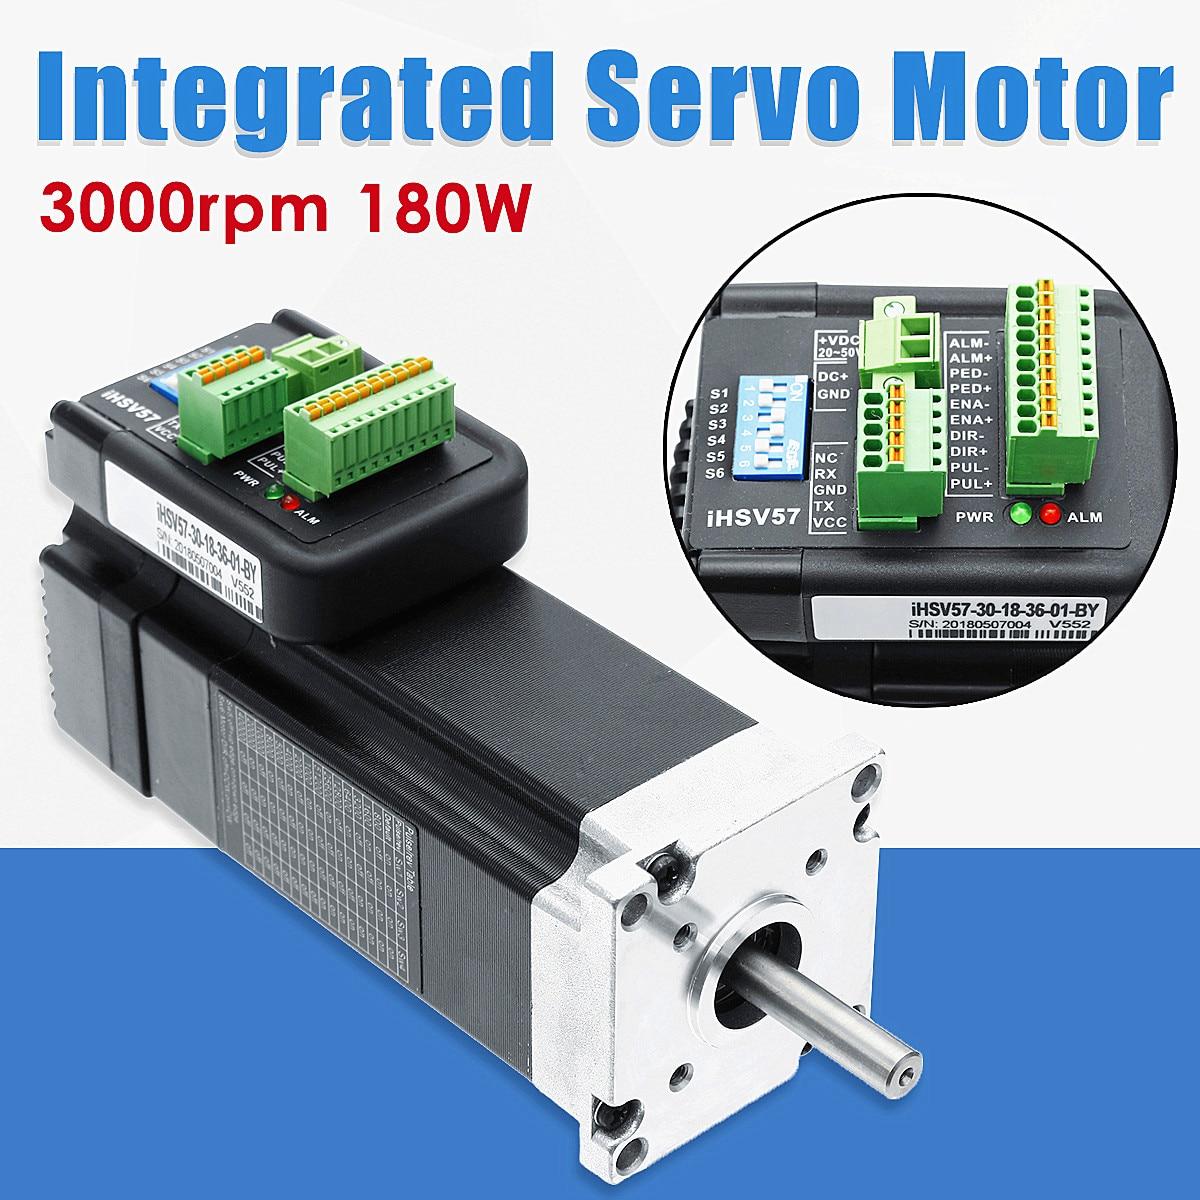 180W 3000rpm NEMA23 0.57Nm Integrated Servo Motor 36VDC JMC iHSV57-30-18-36 New Arrival nema23 2nm 283oz in integrated closed loop stepper motor with driver 36vdc jmc ihss57 36 20